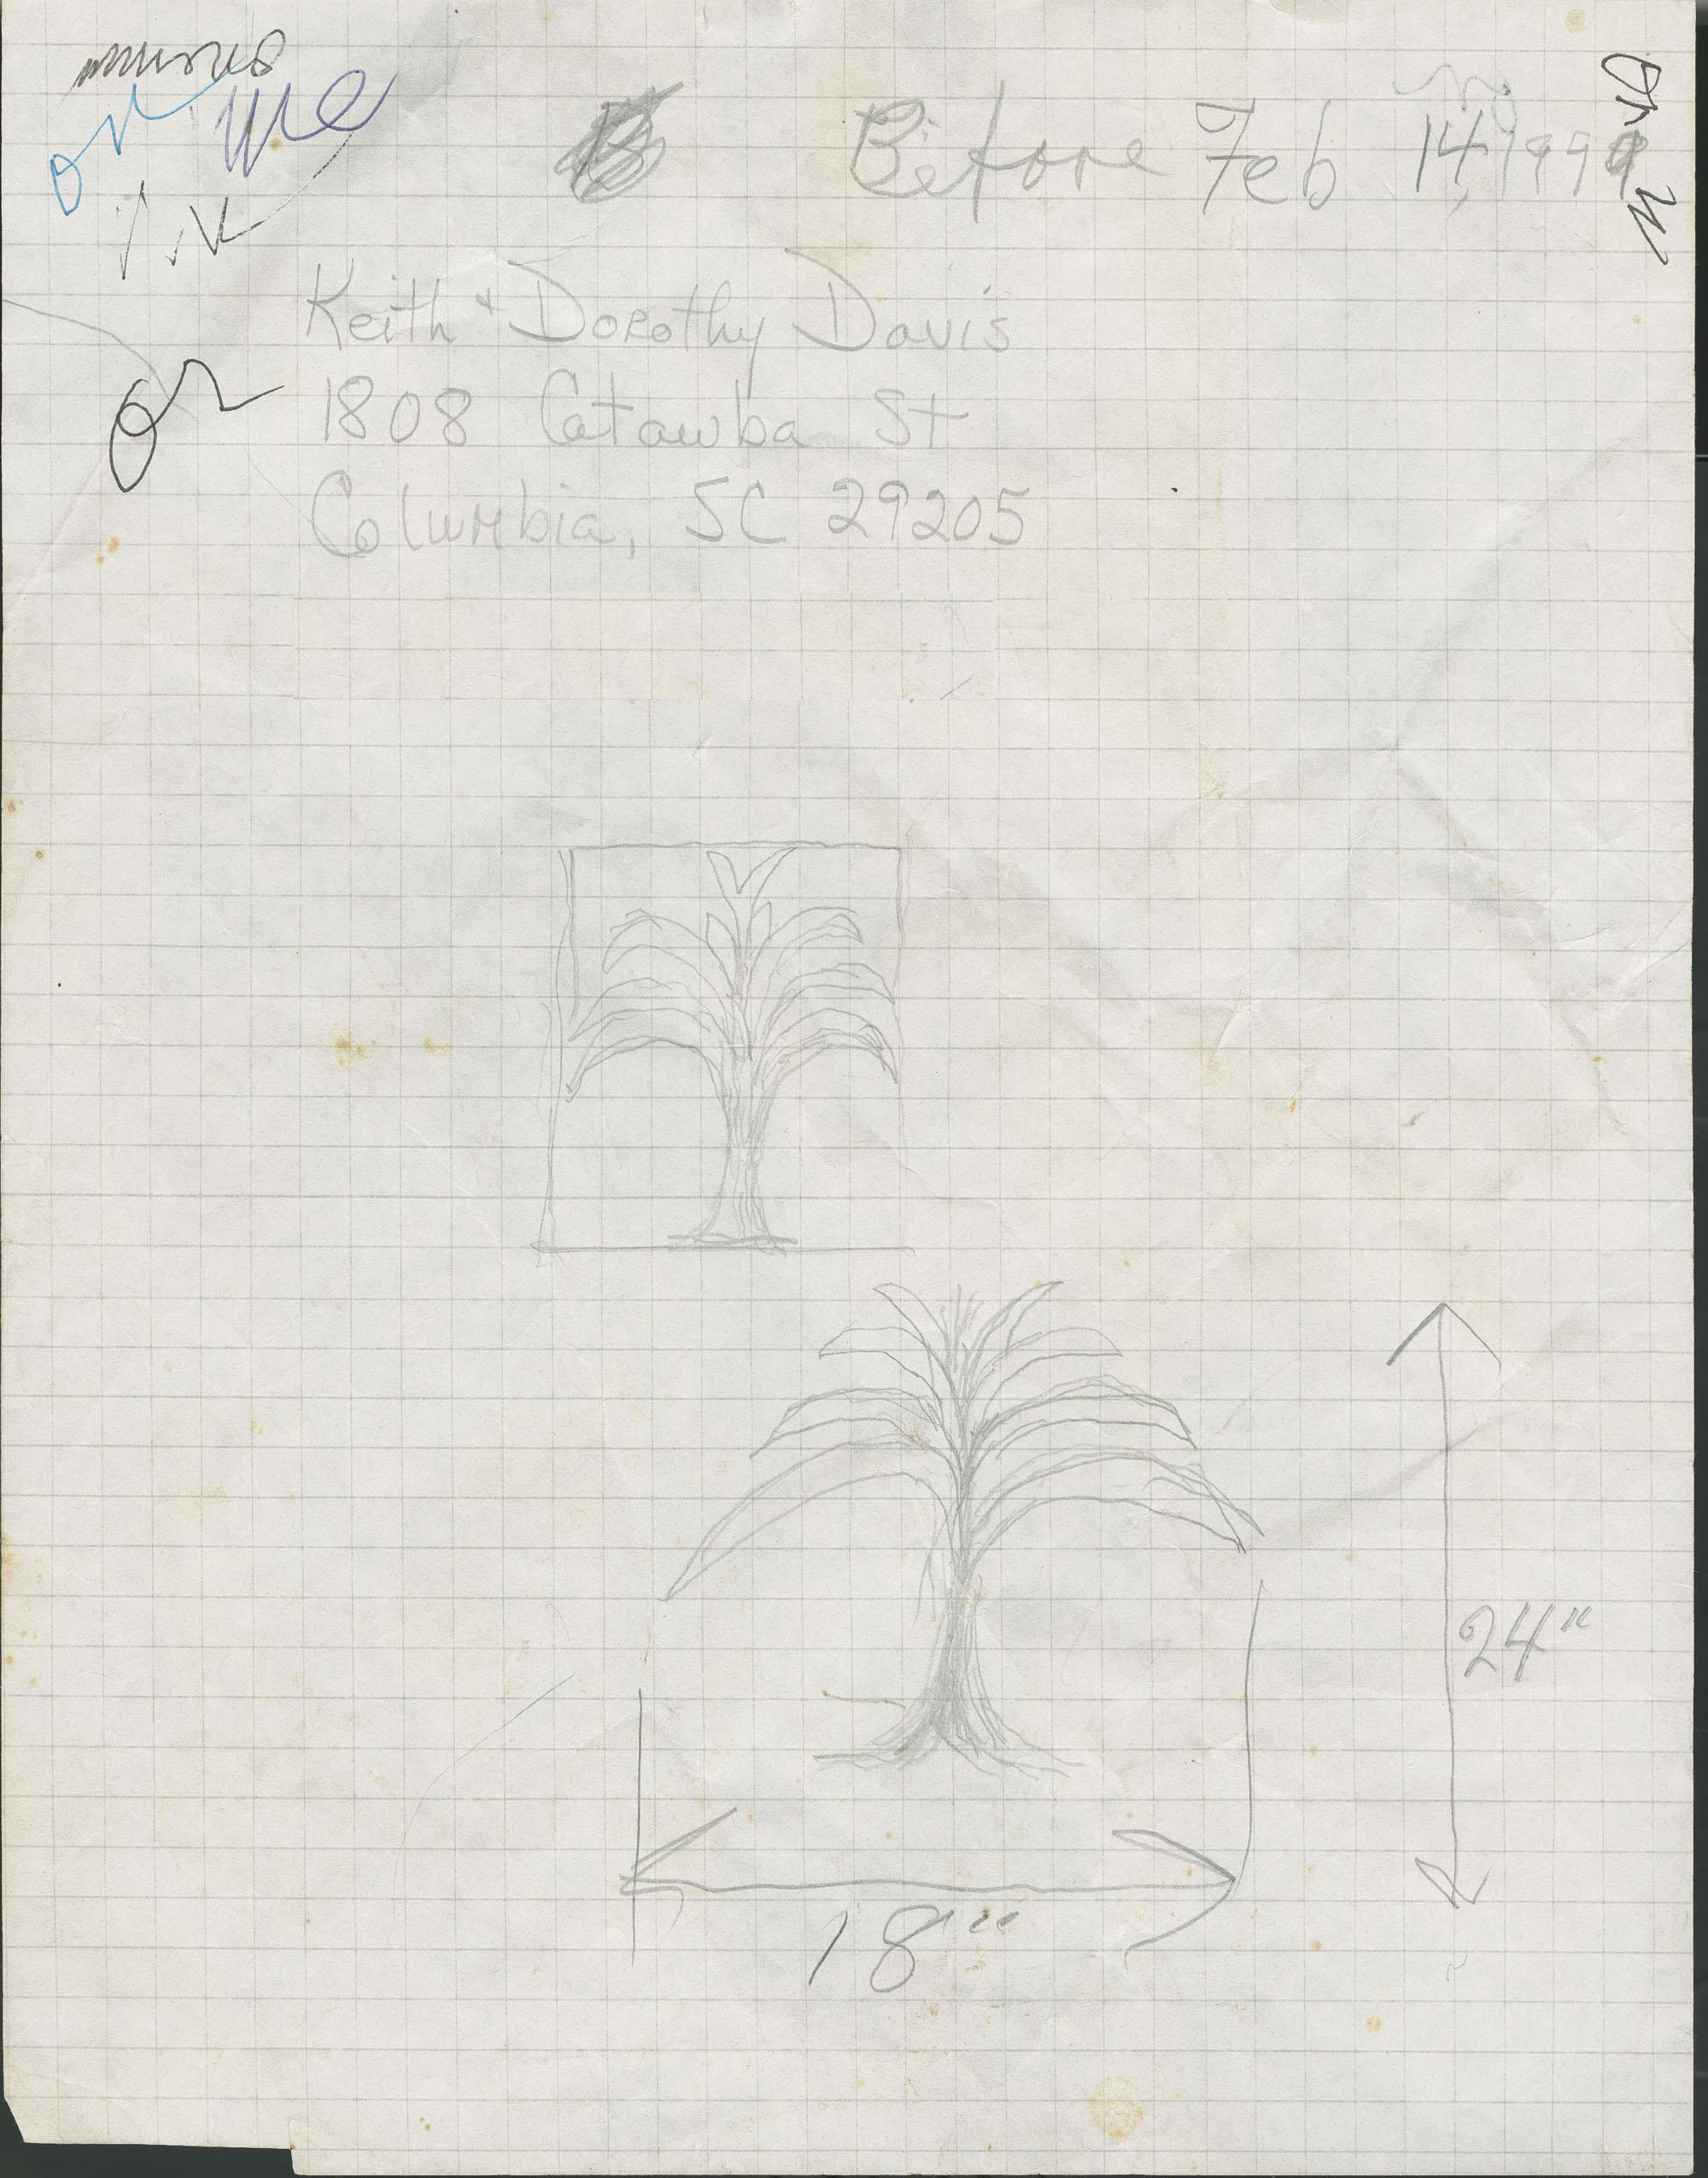 1808 Catawba Street, Columbia, South Carolina drawing of Palmetto trees and hearts.